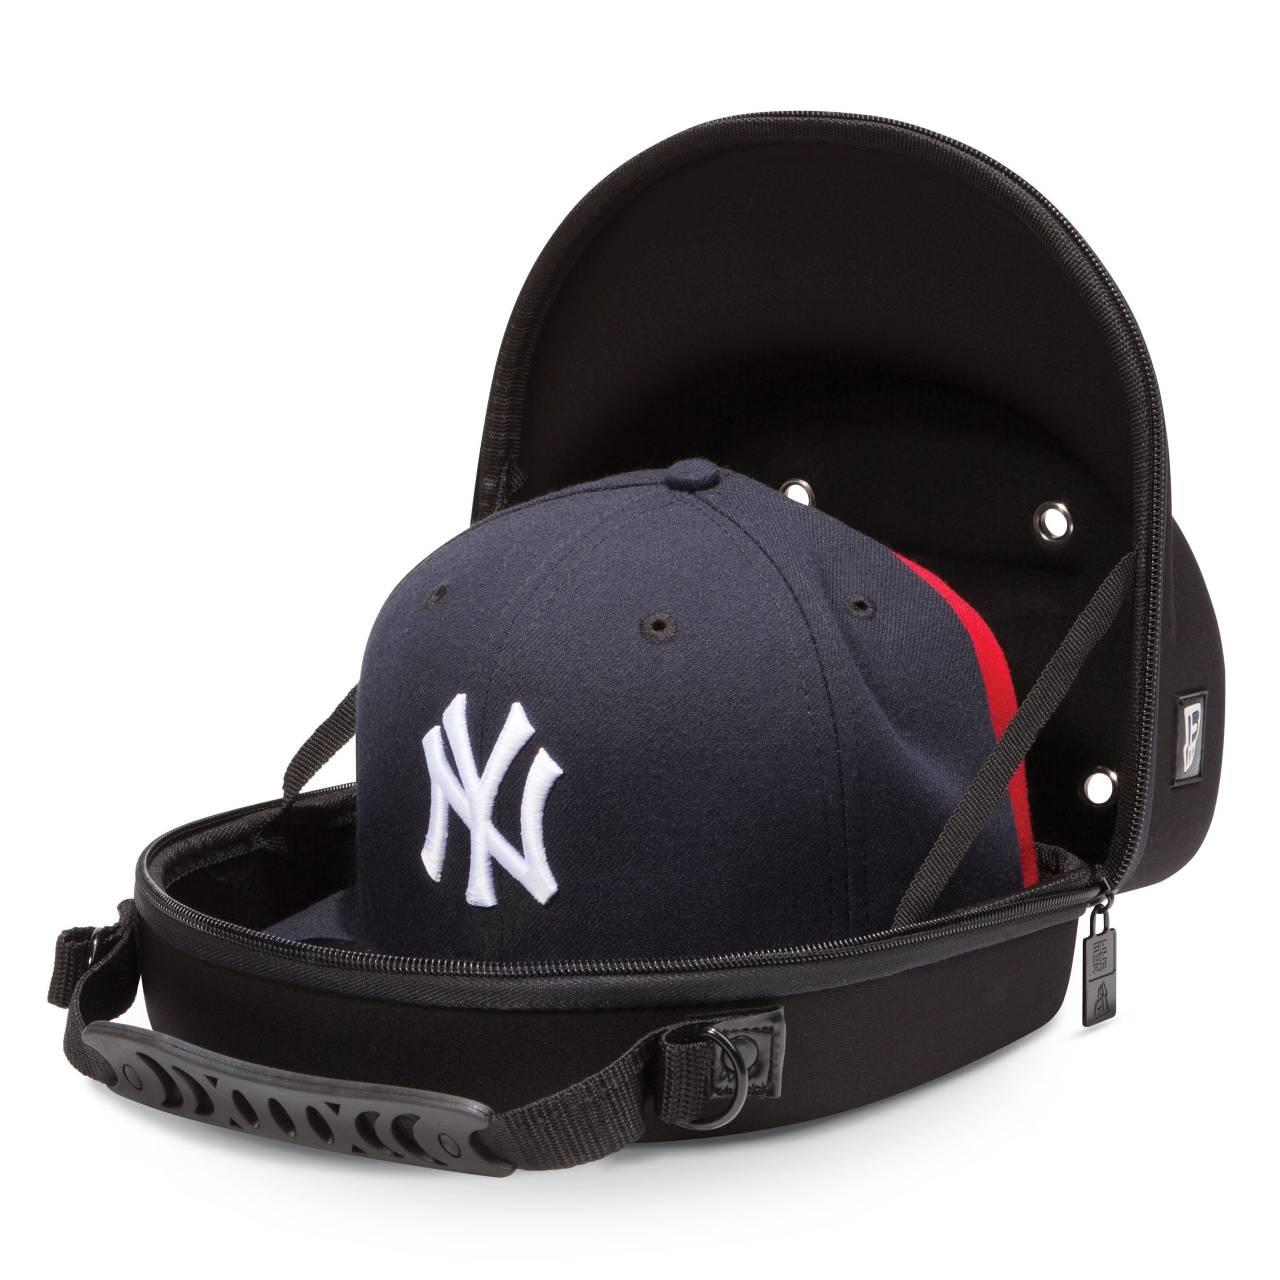 10030708 CAP CARRIER 2PACK NEW ERA BLACK BAG